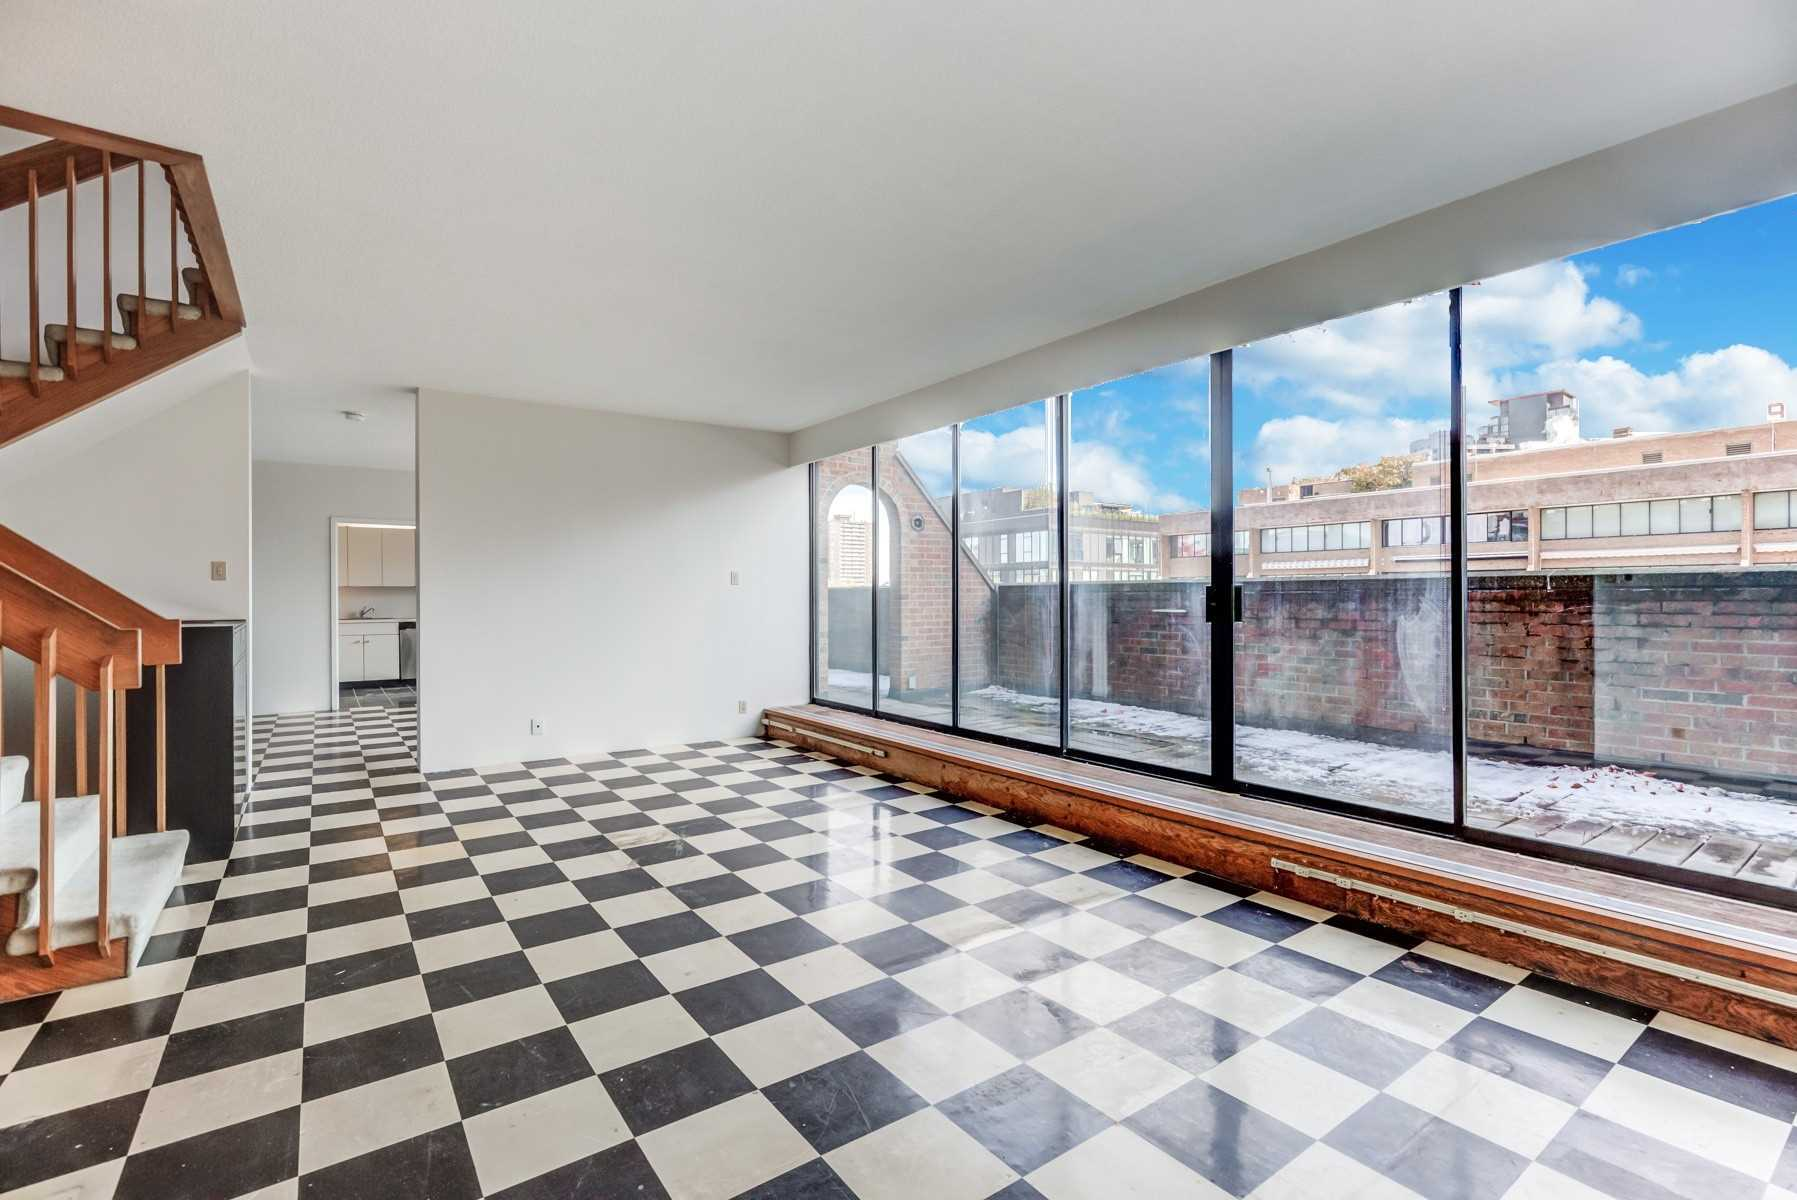 607 - 55A Avenue Rd - Annex Condo Apt for sale, 2 Bedrooms (C5185690) - #14